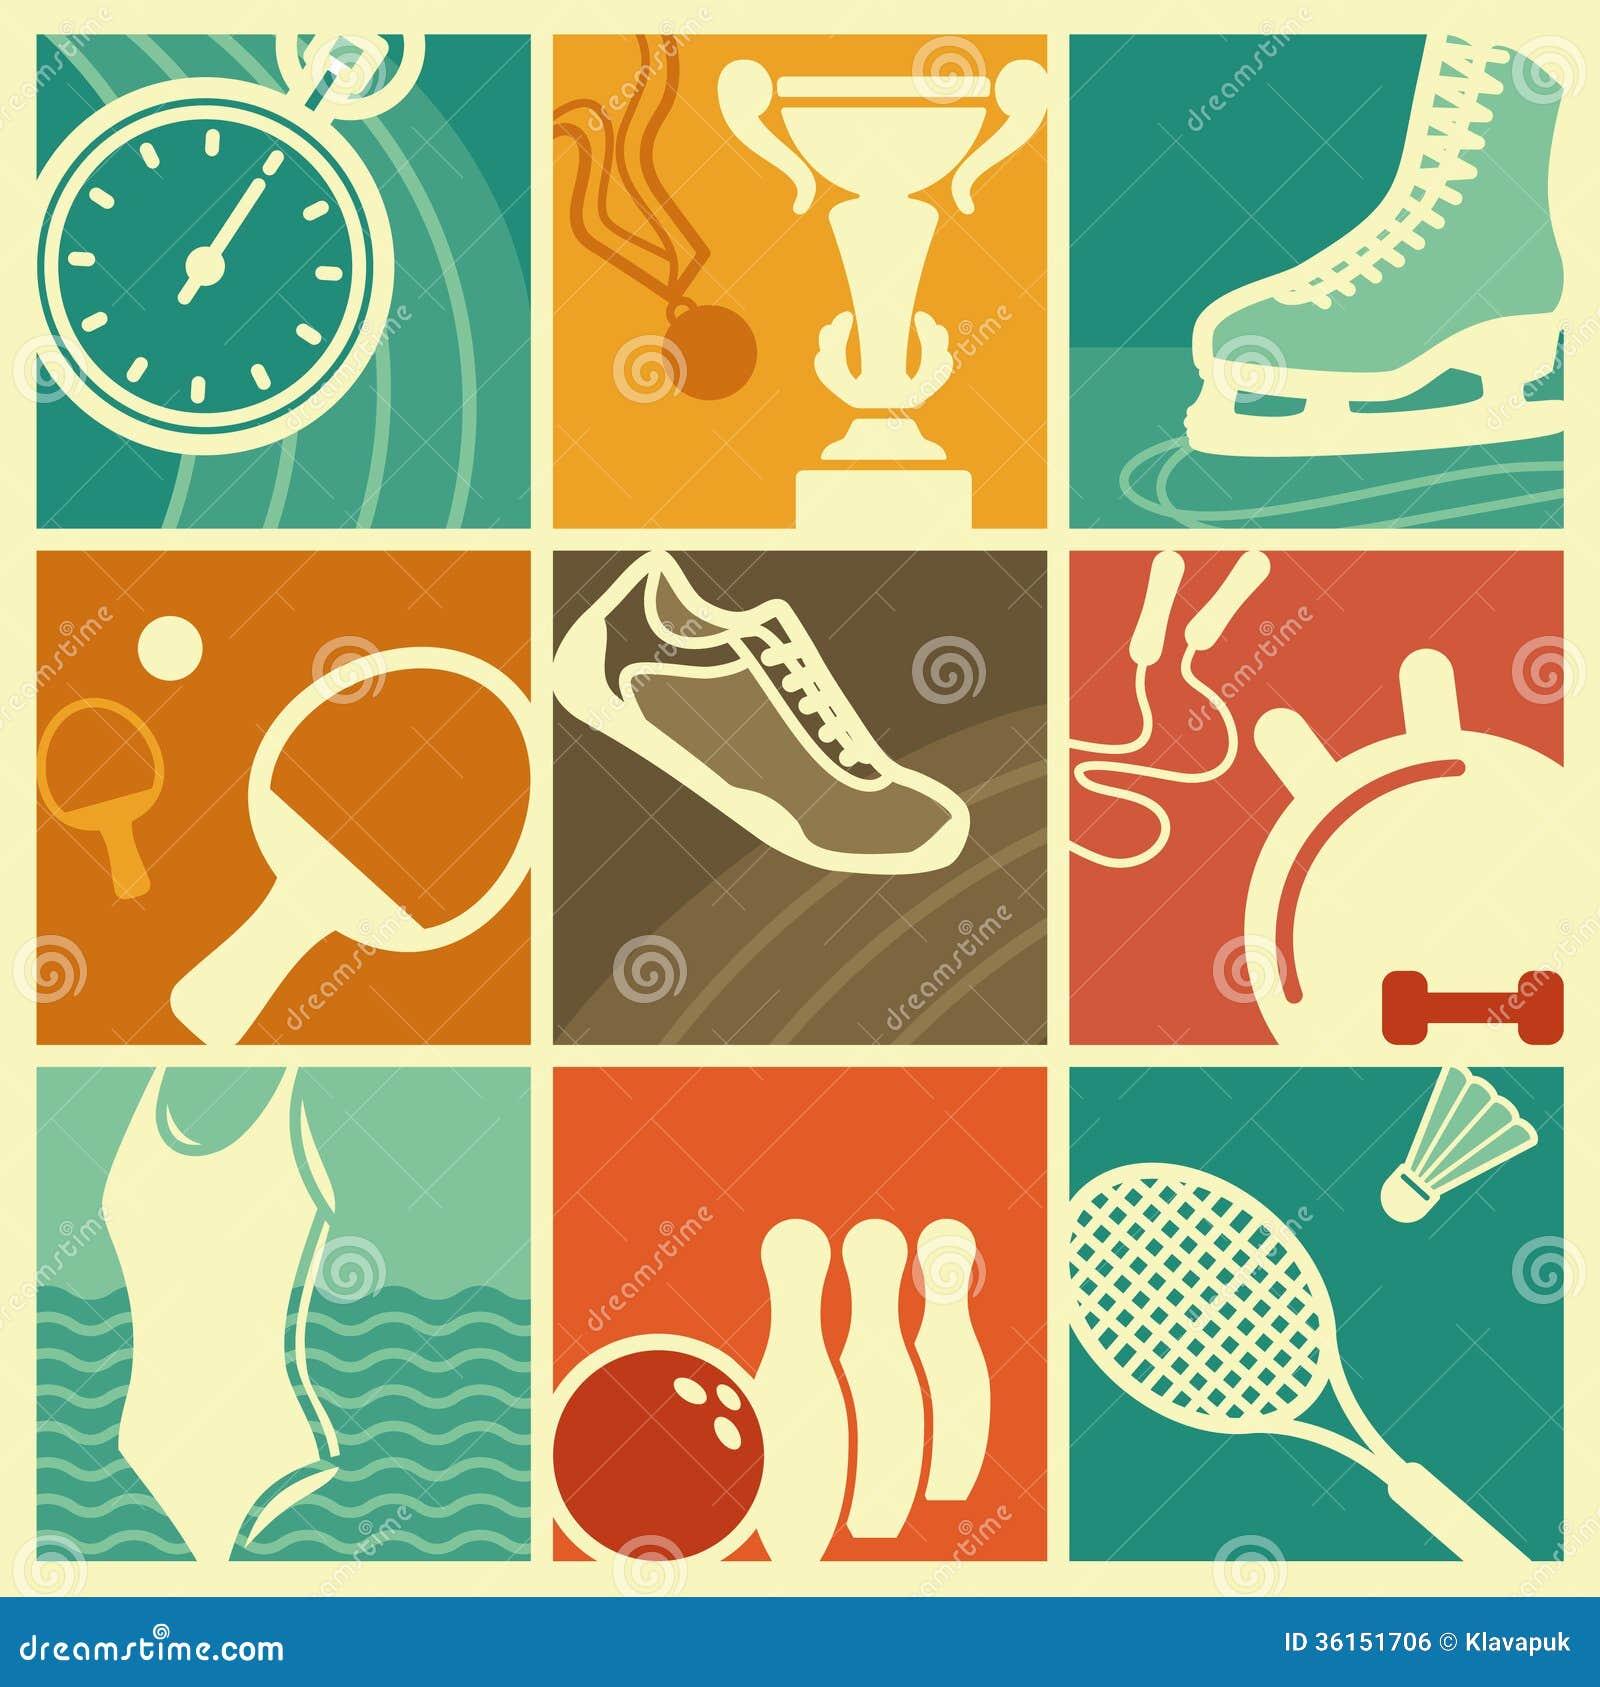 Vintage Sport Symbols Royalty Free Stock Image